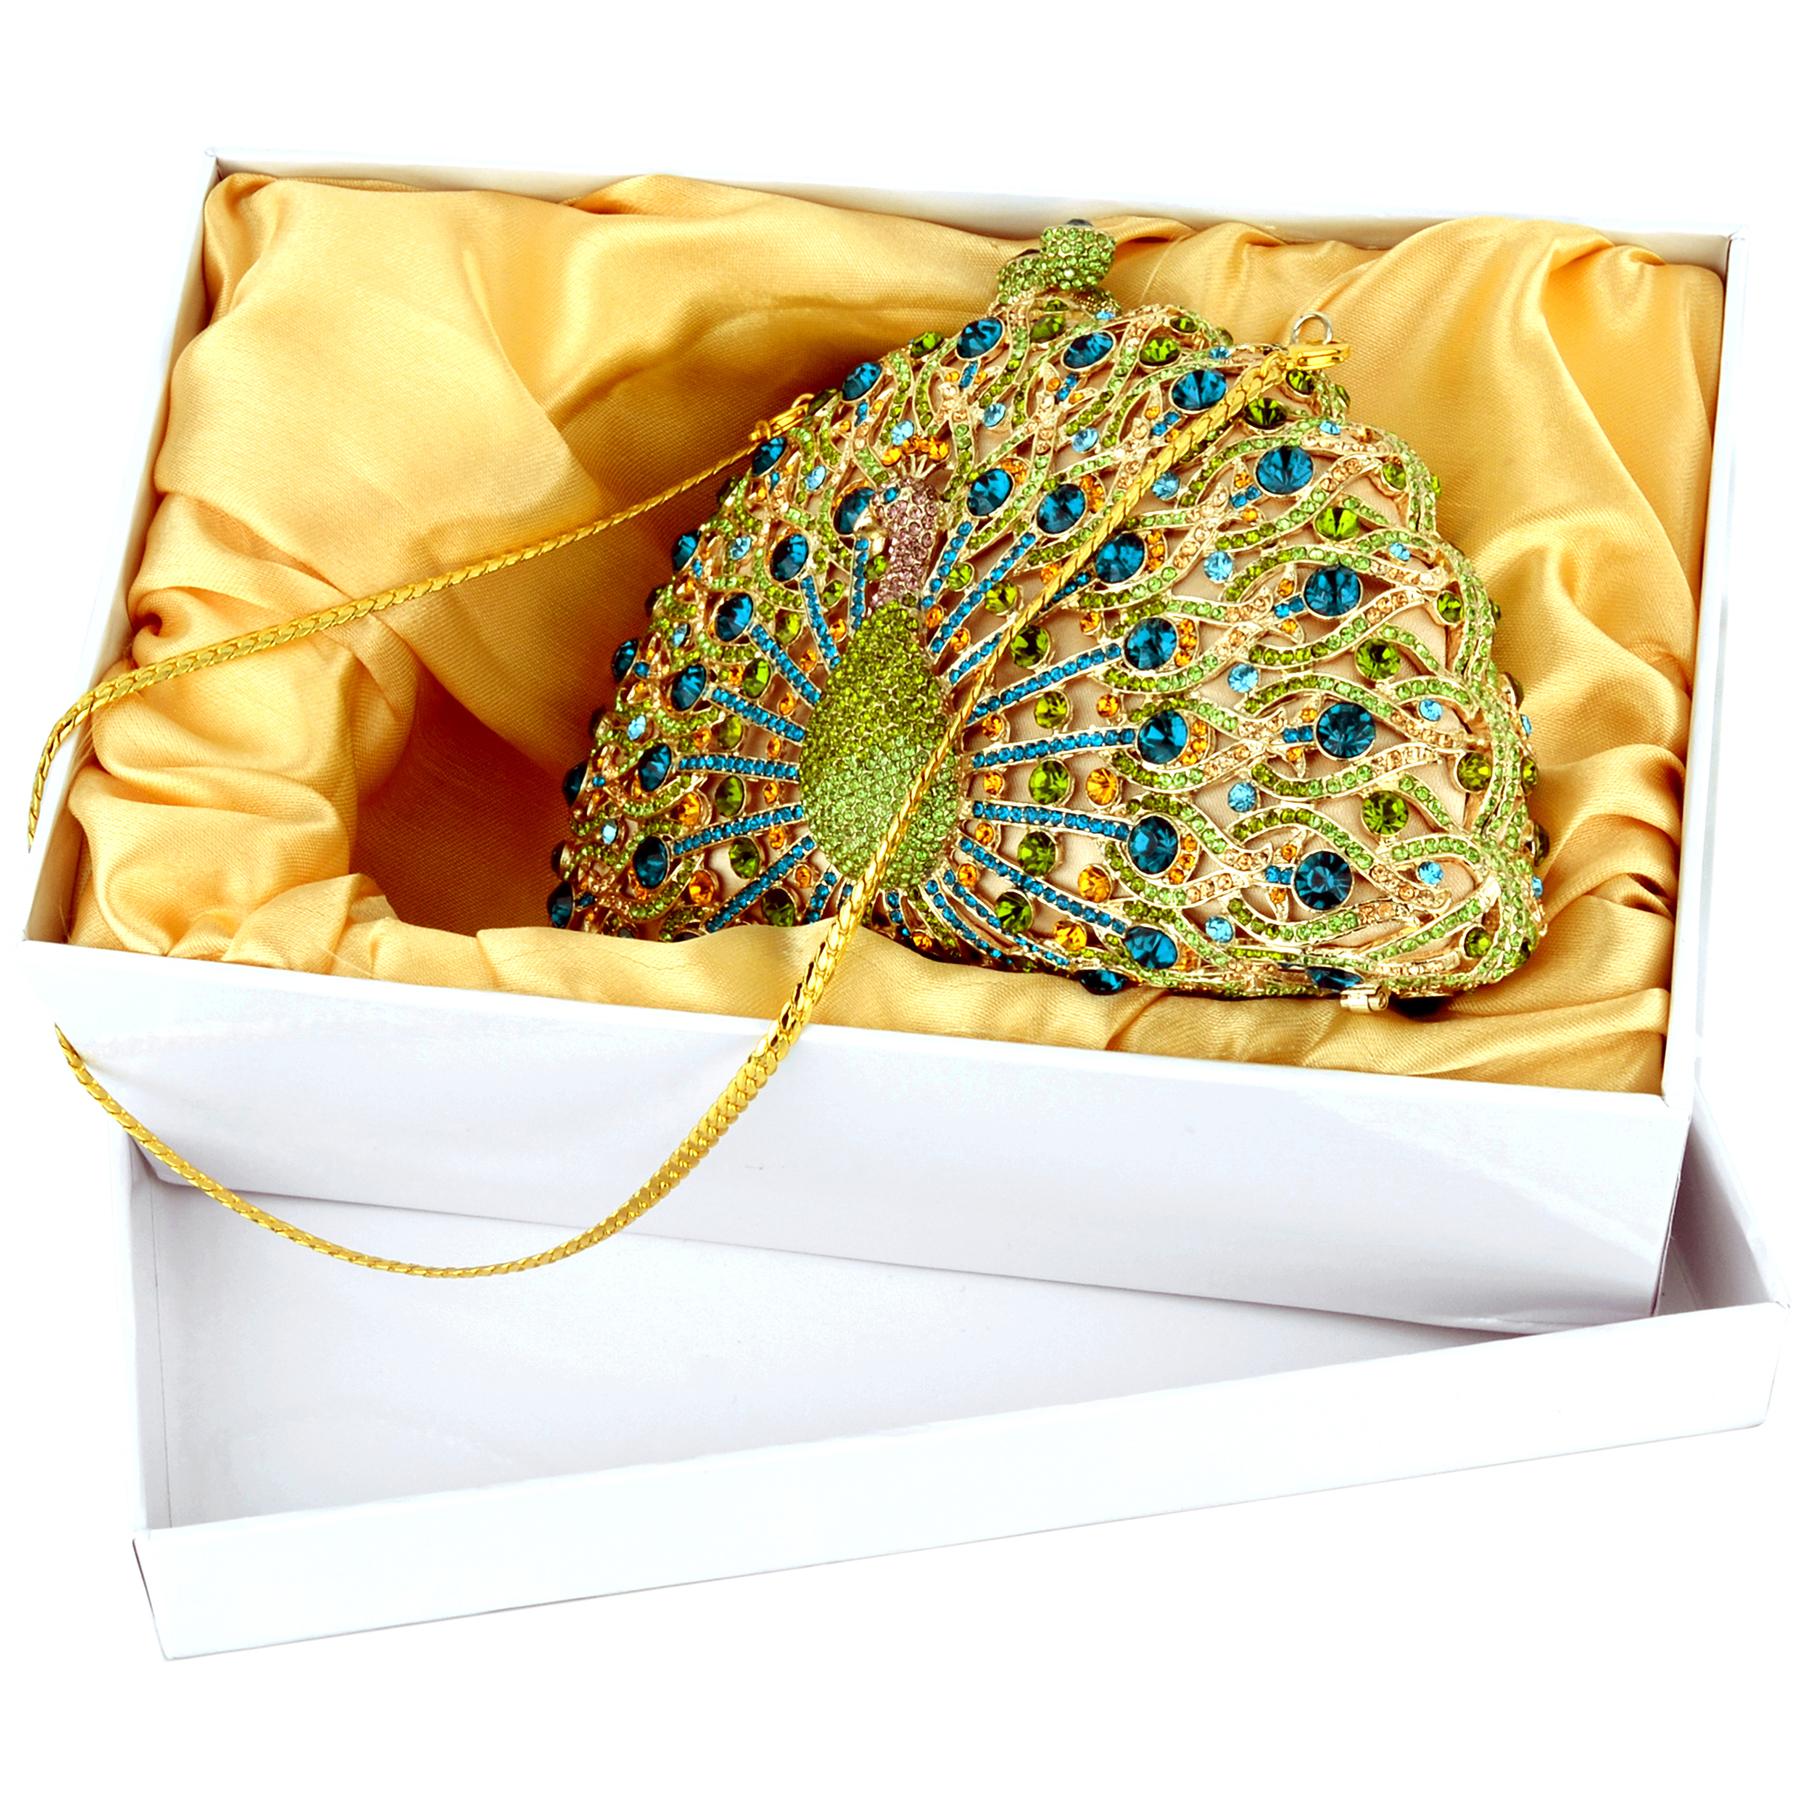 CLARA Green Crystal Peacock Evening Bag in box